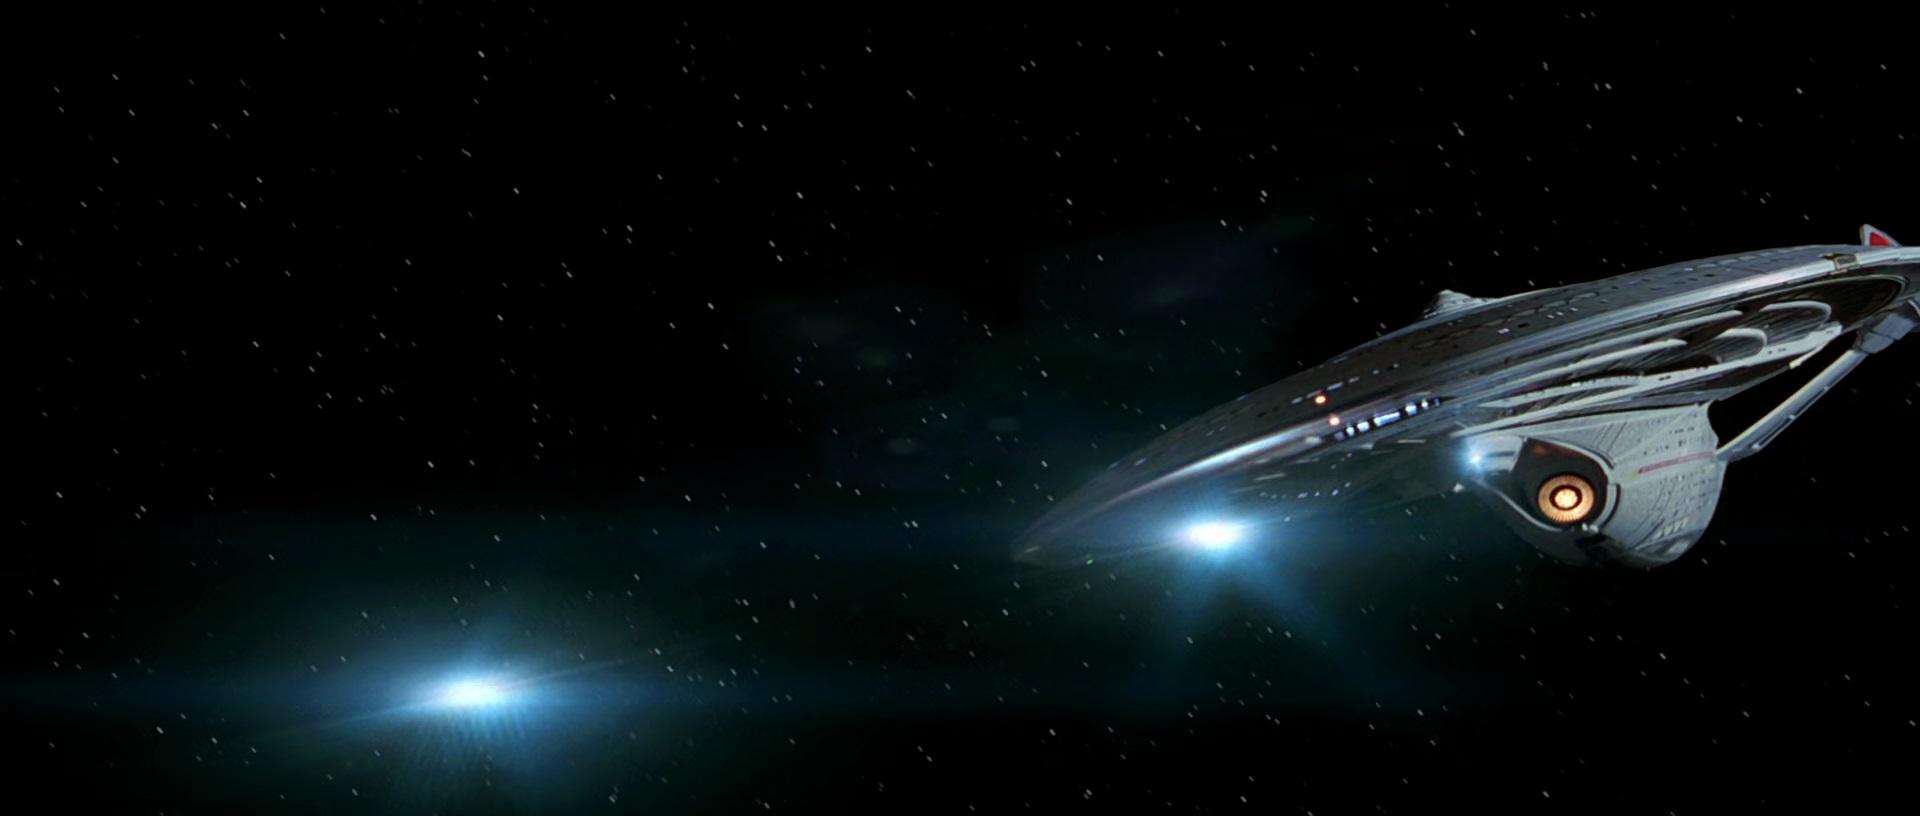 File:USS Enterprise-E firing quantum torpedoes.jpg